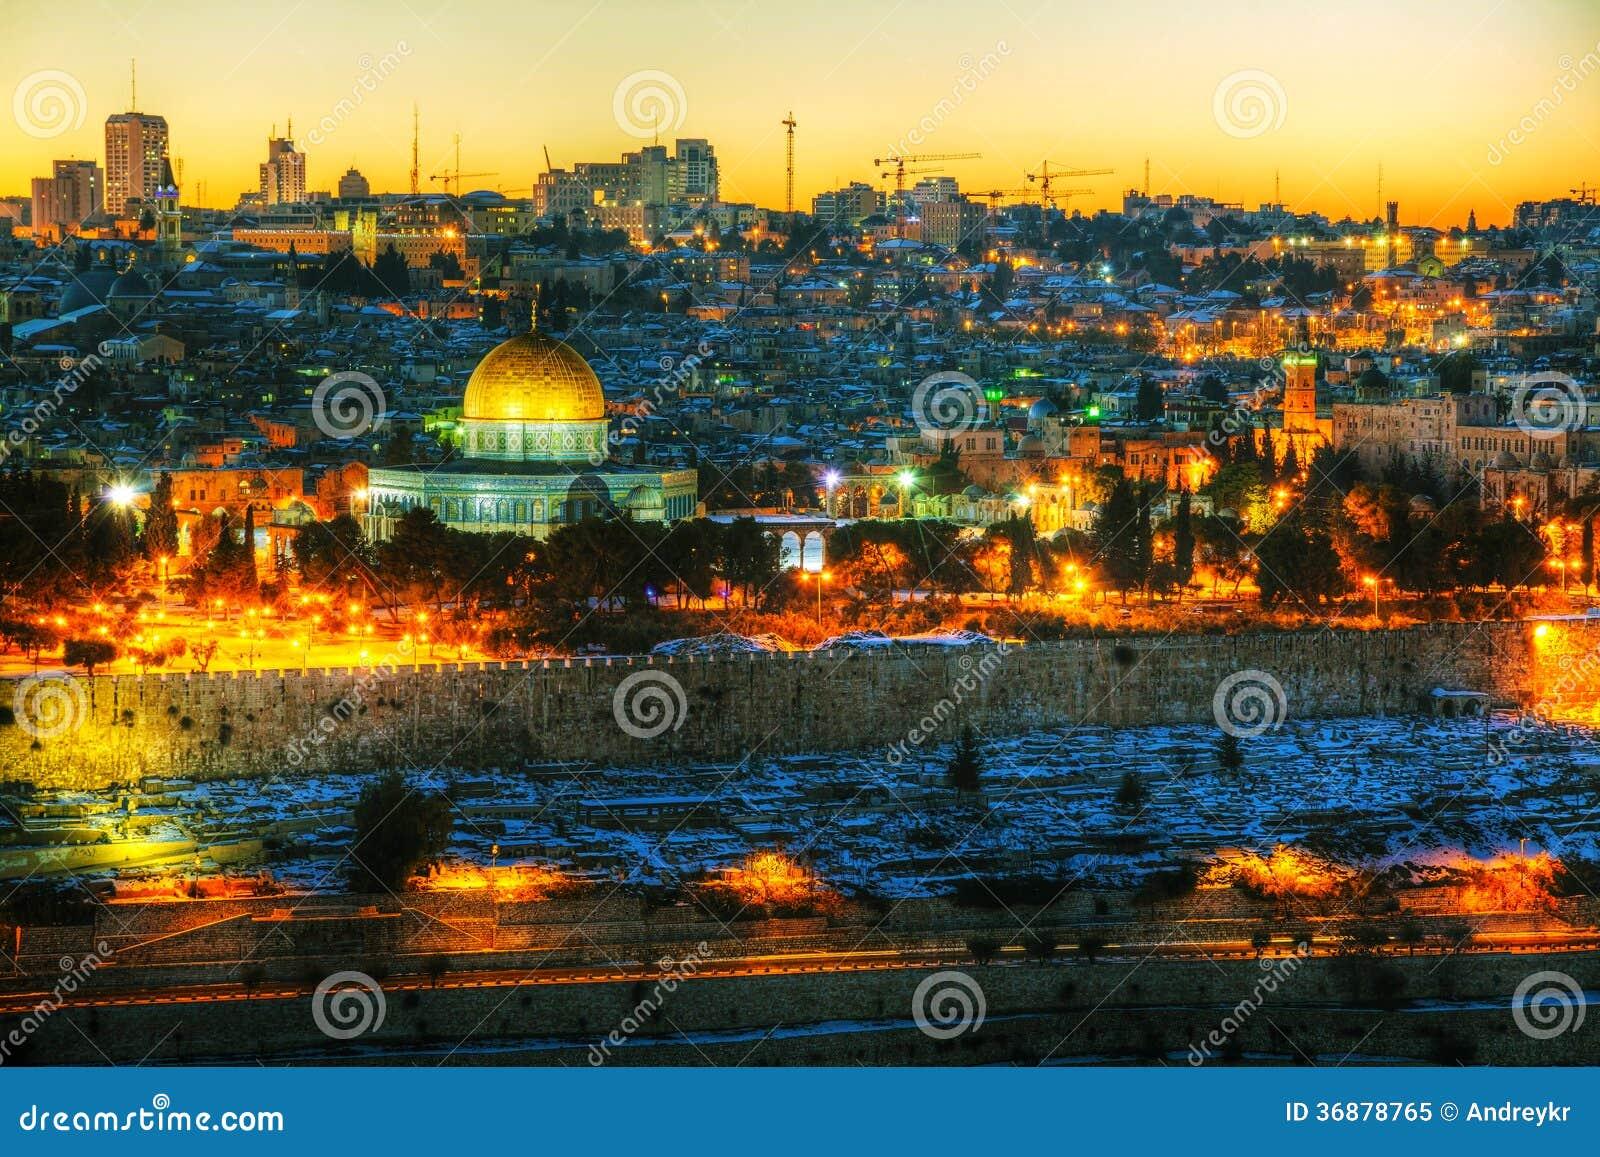 Download Panoramica Di Vecchia Città A Gerusalemme, Israele Immagine Stock - Immagine di cityscape, roccia: 36878765